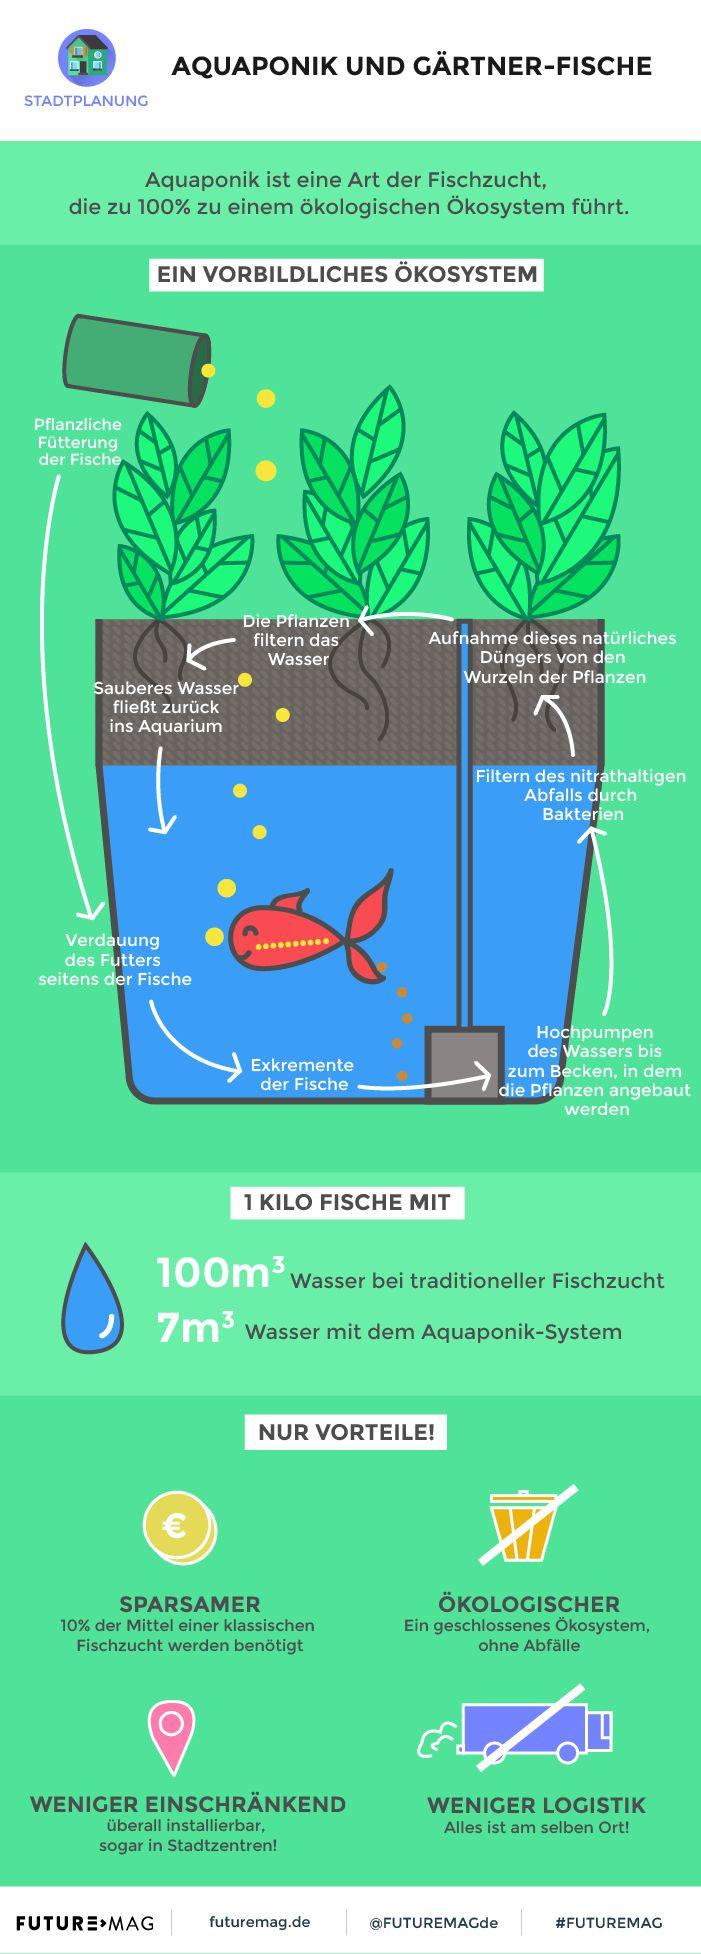 14 best aquaponie images on pinterest gardening plants and aquarium